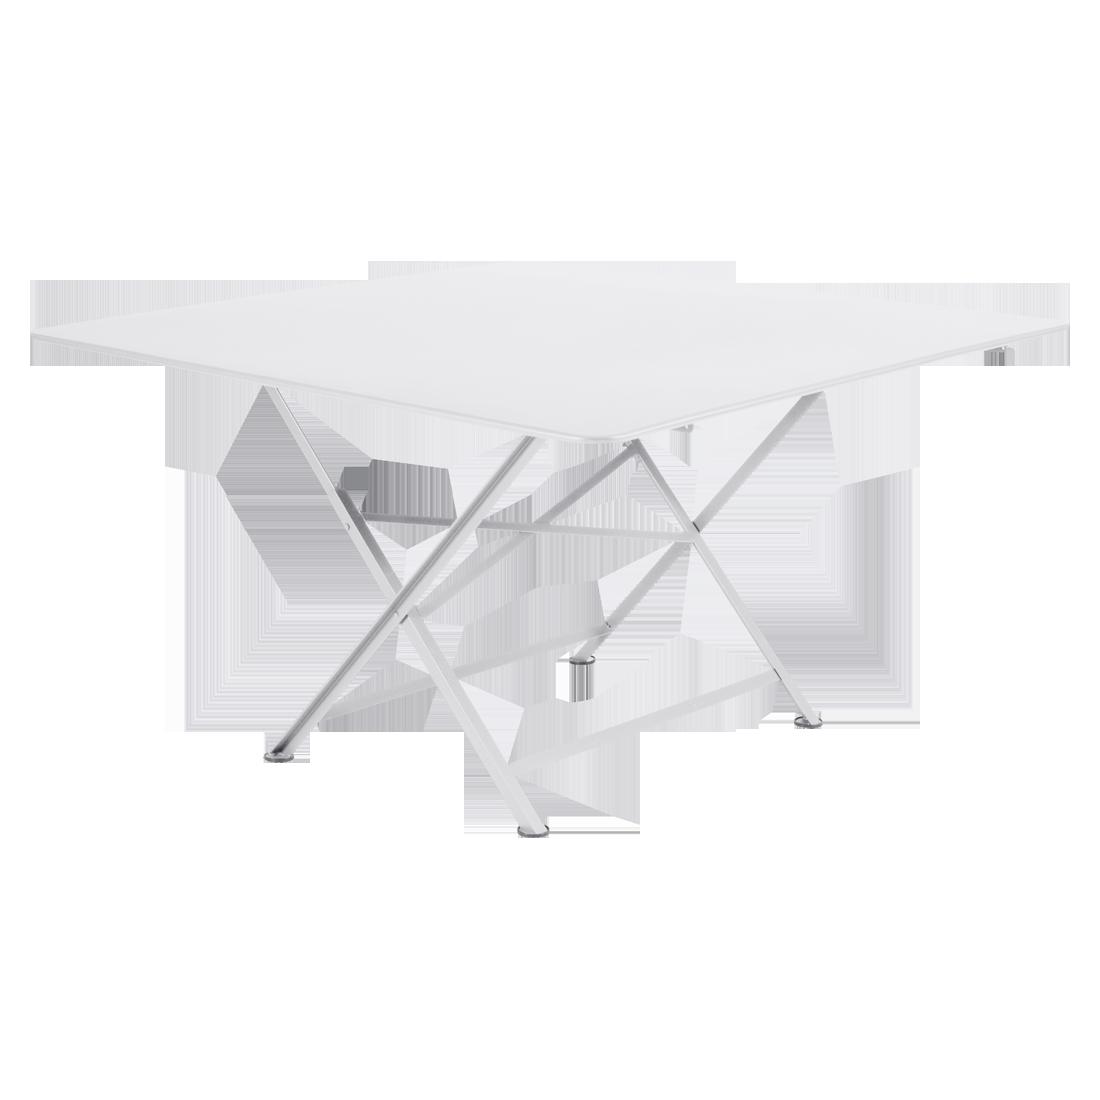 table de jardin pliante, table metal carree, table metal 8 personnes, table de jardin blanche, table metal blanche